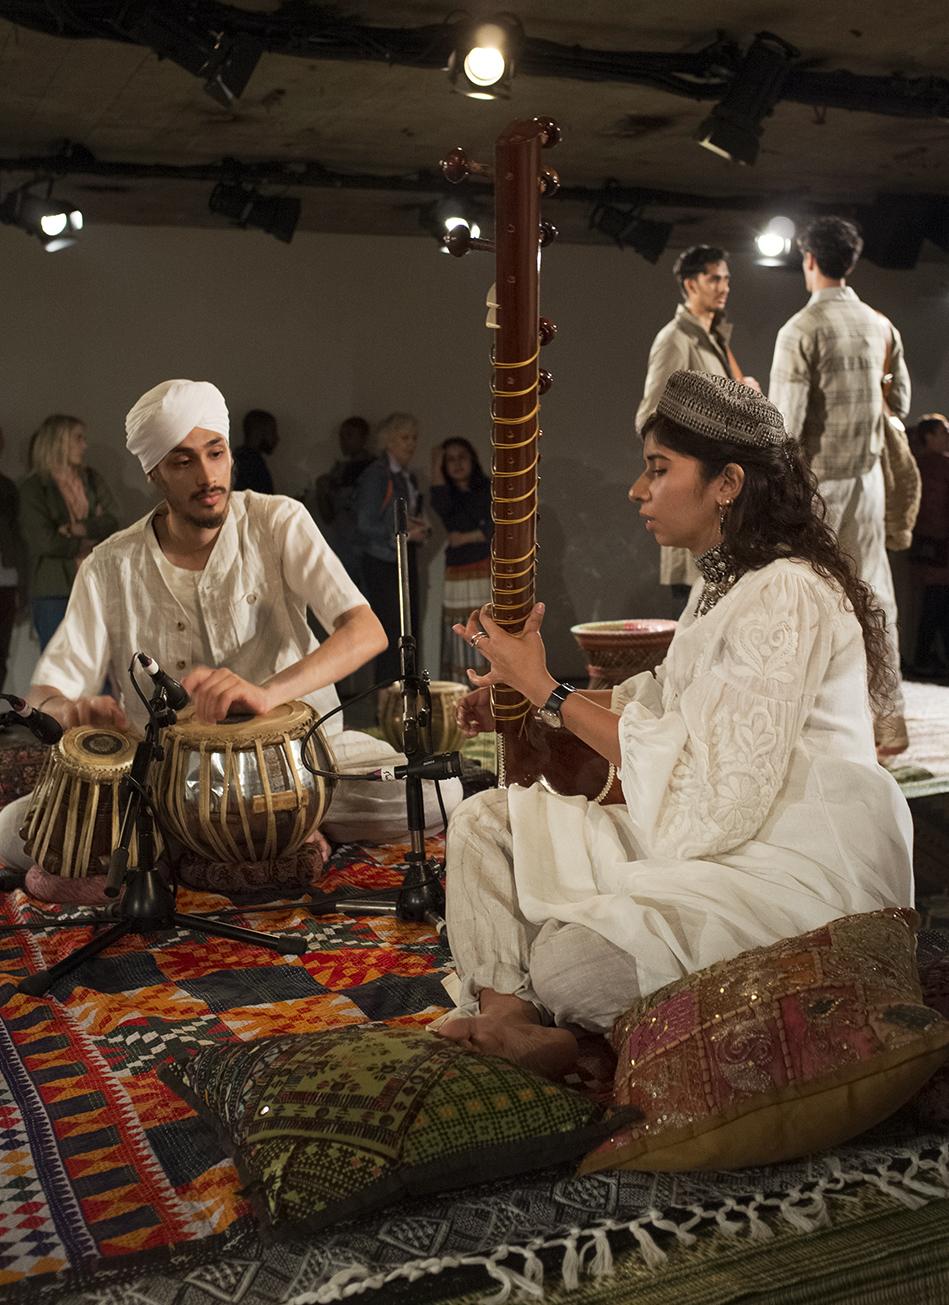 Nicholas Daley SS18 Presentation Image _ Nabihah Iqbal on sitar and Golu Singh Gaba on tabla _ Photo Anastasia Sheveleva.jpg